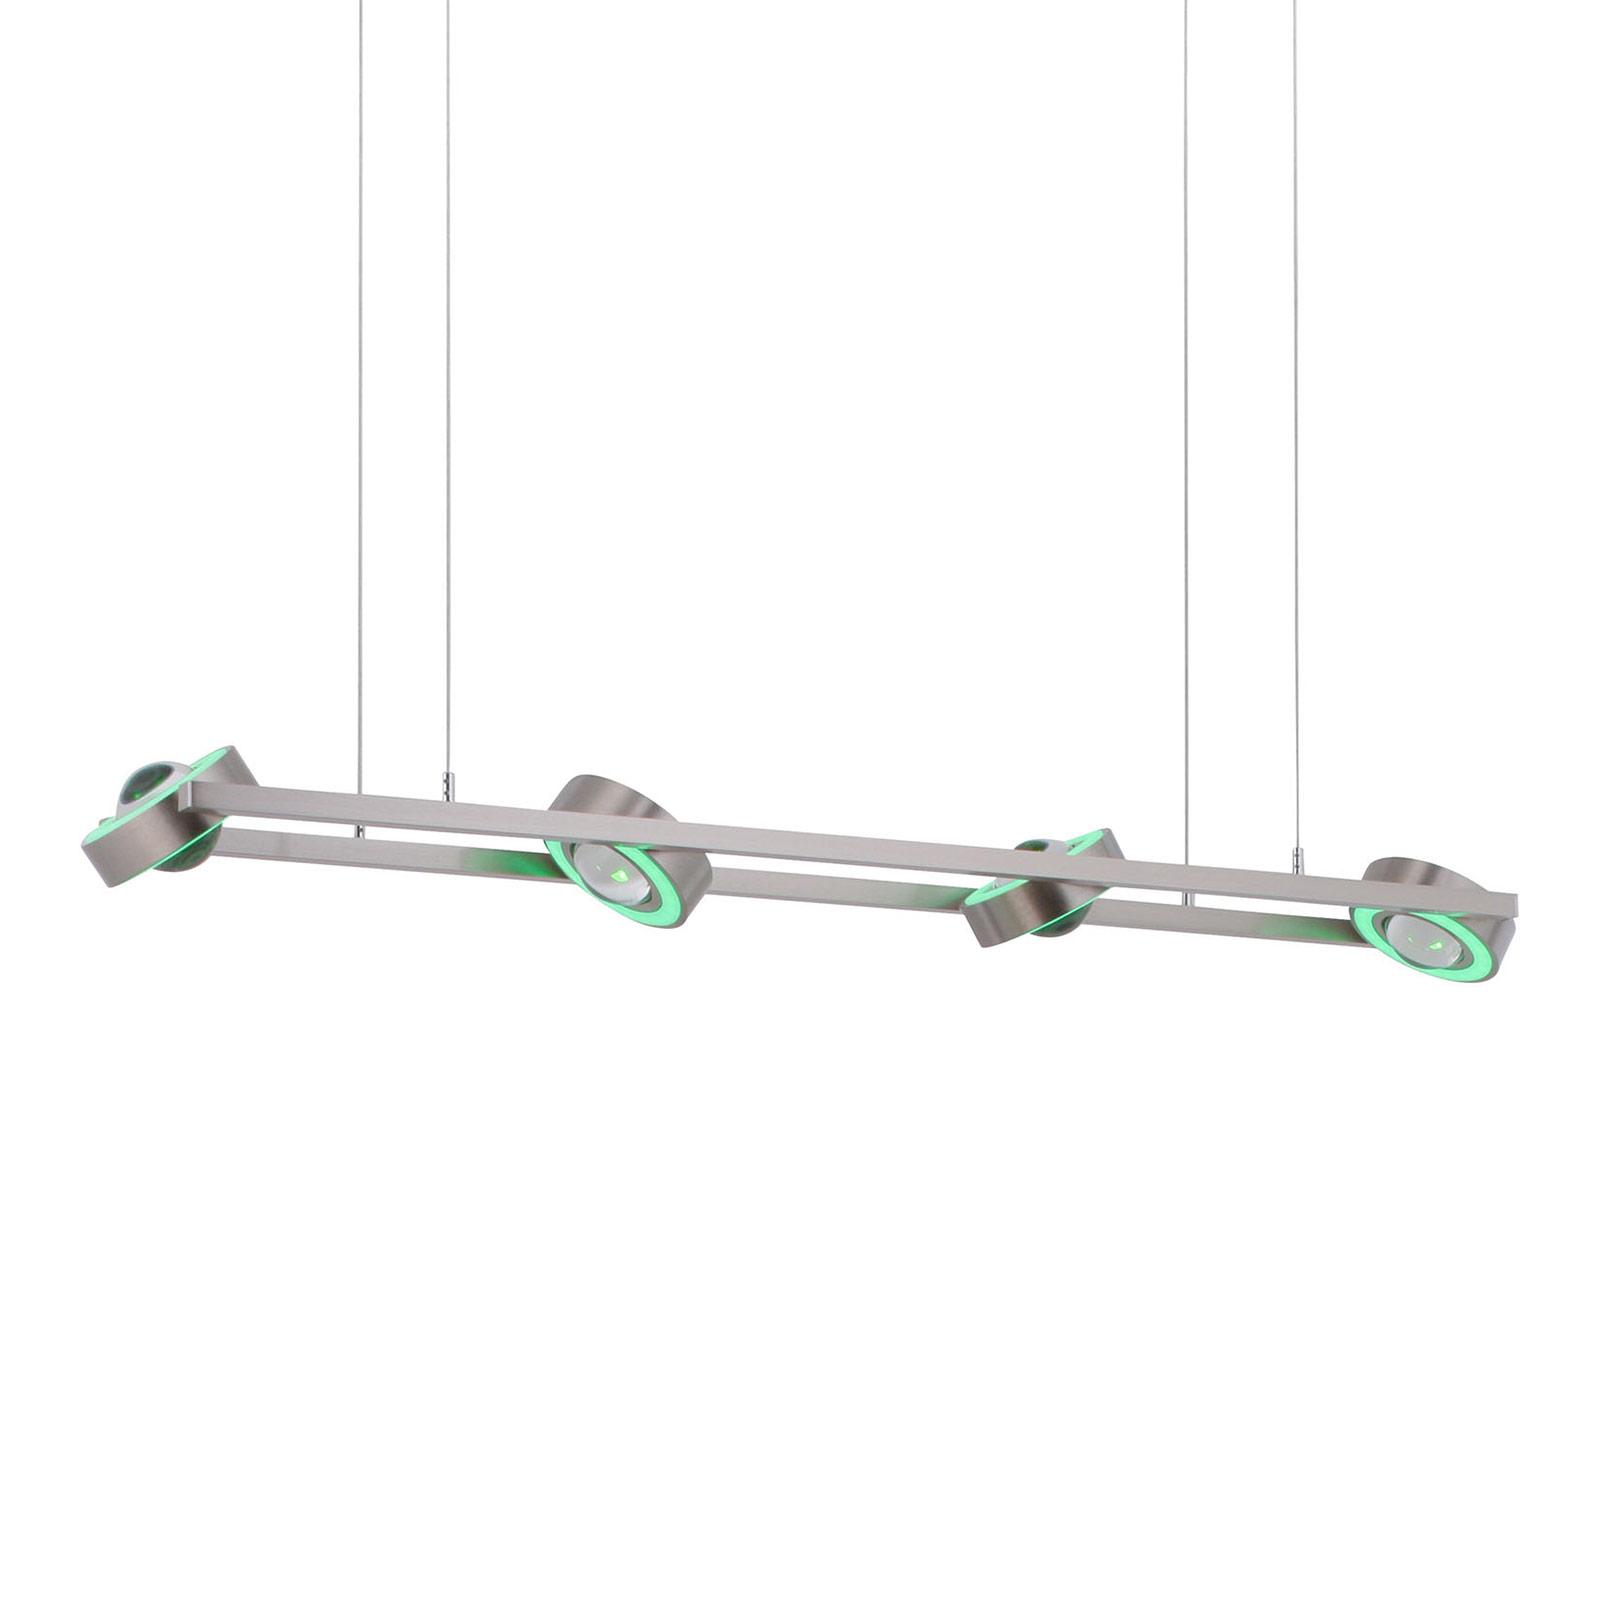 Paul Neuhaus Q-MIA LED-riippuvalaisin, teräs